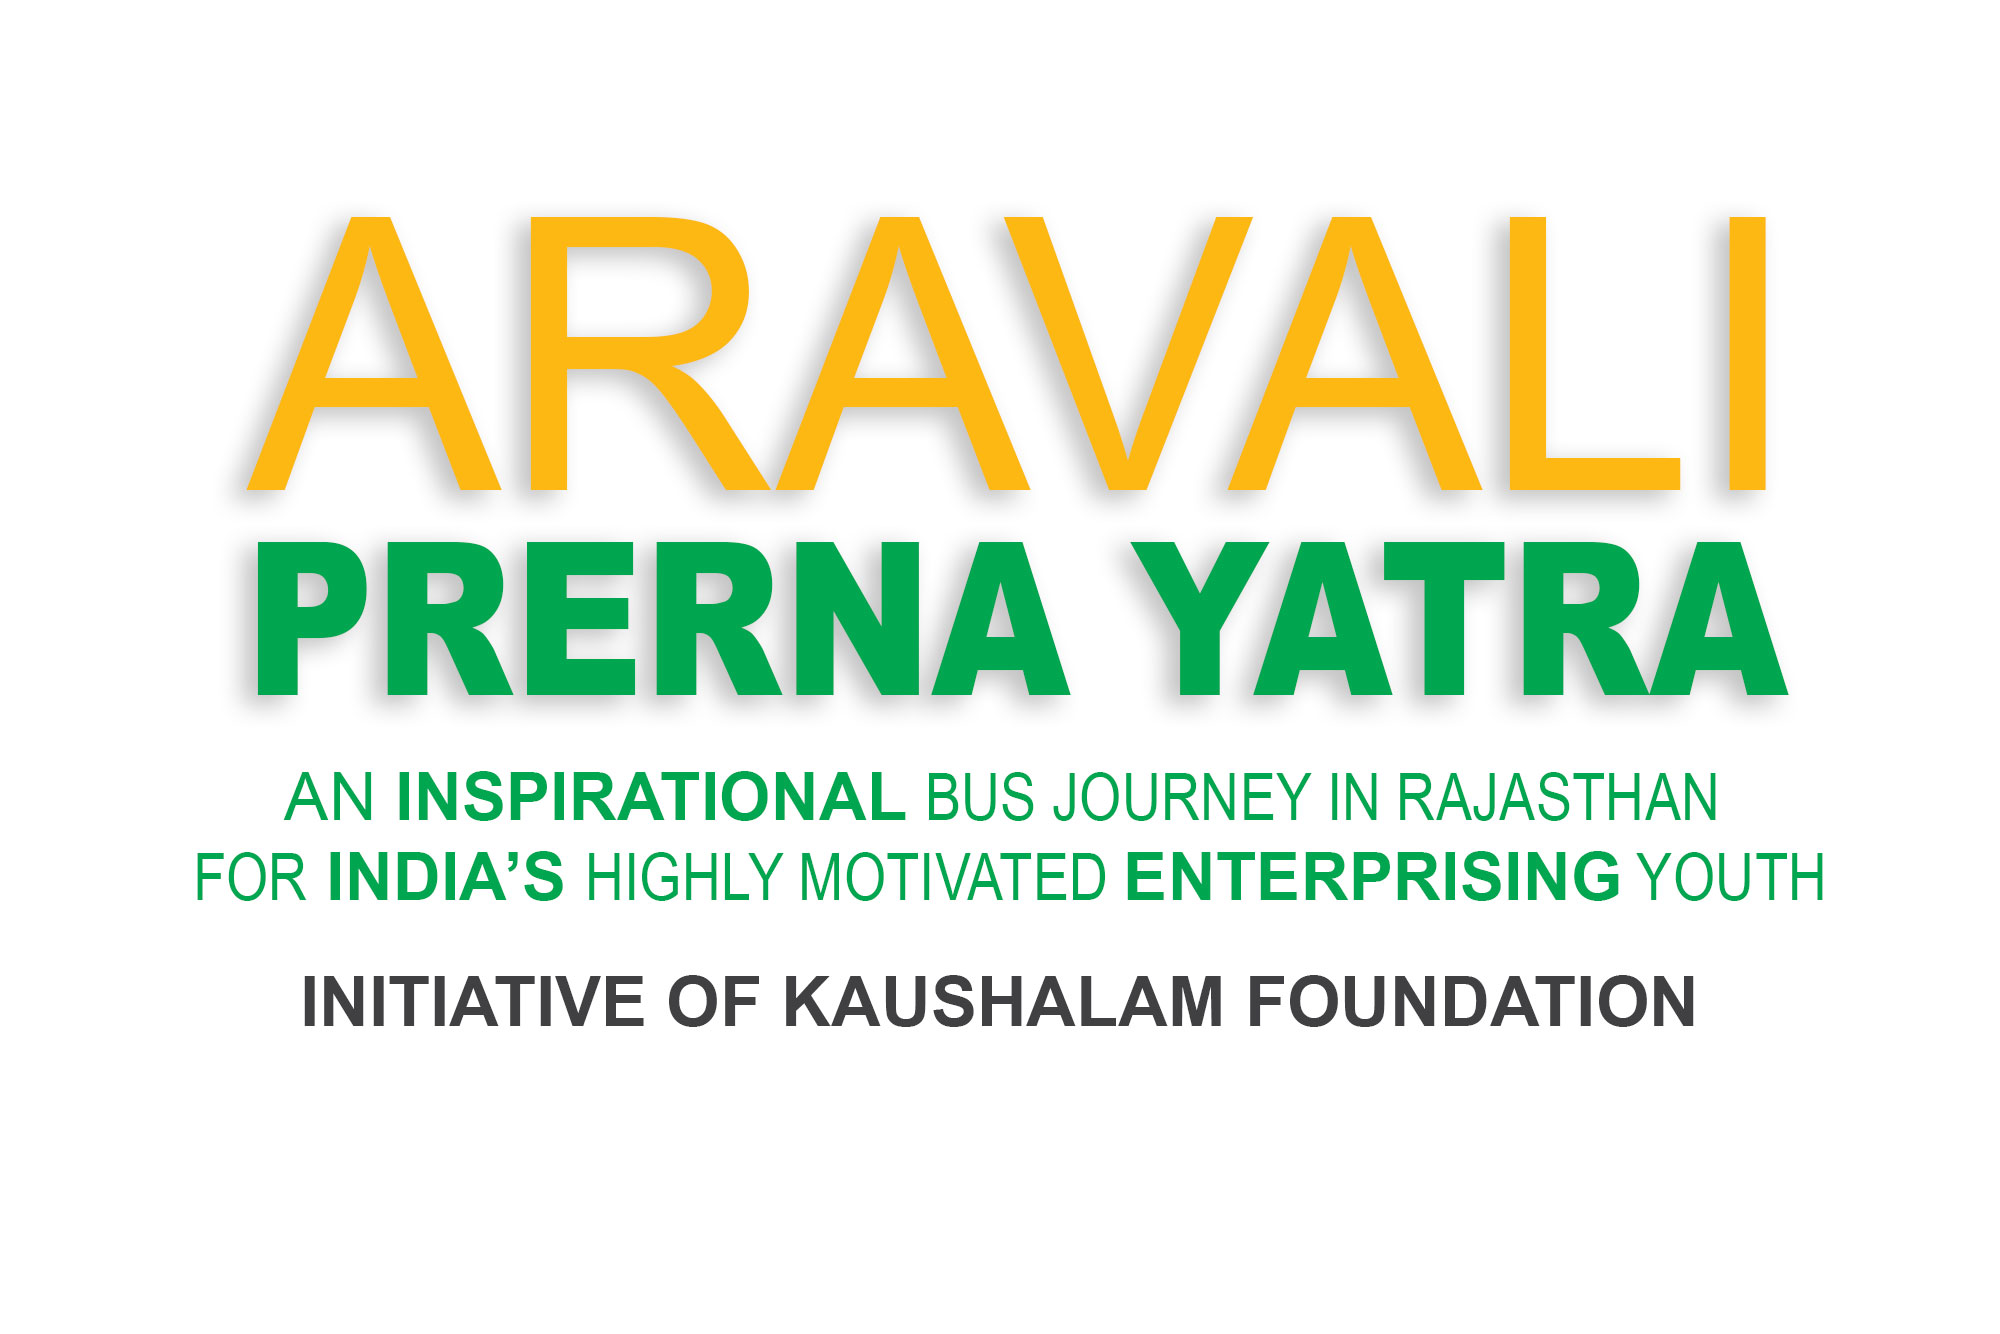 Aravali Prerna Yatra